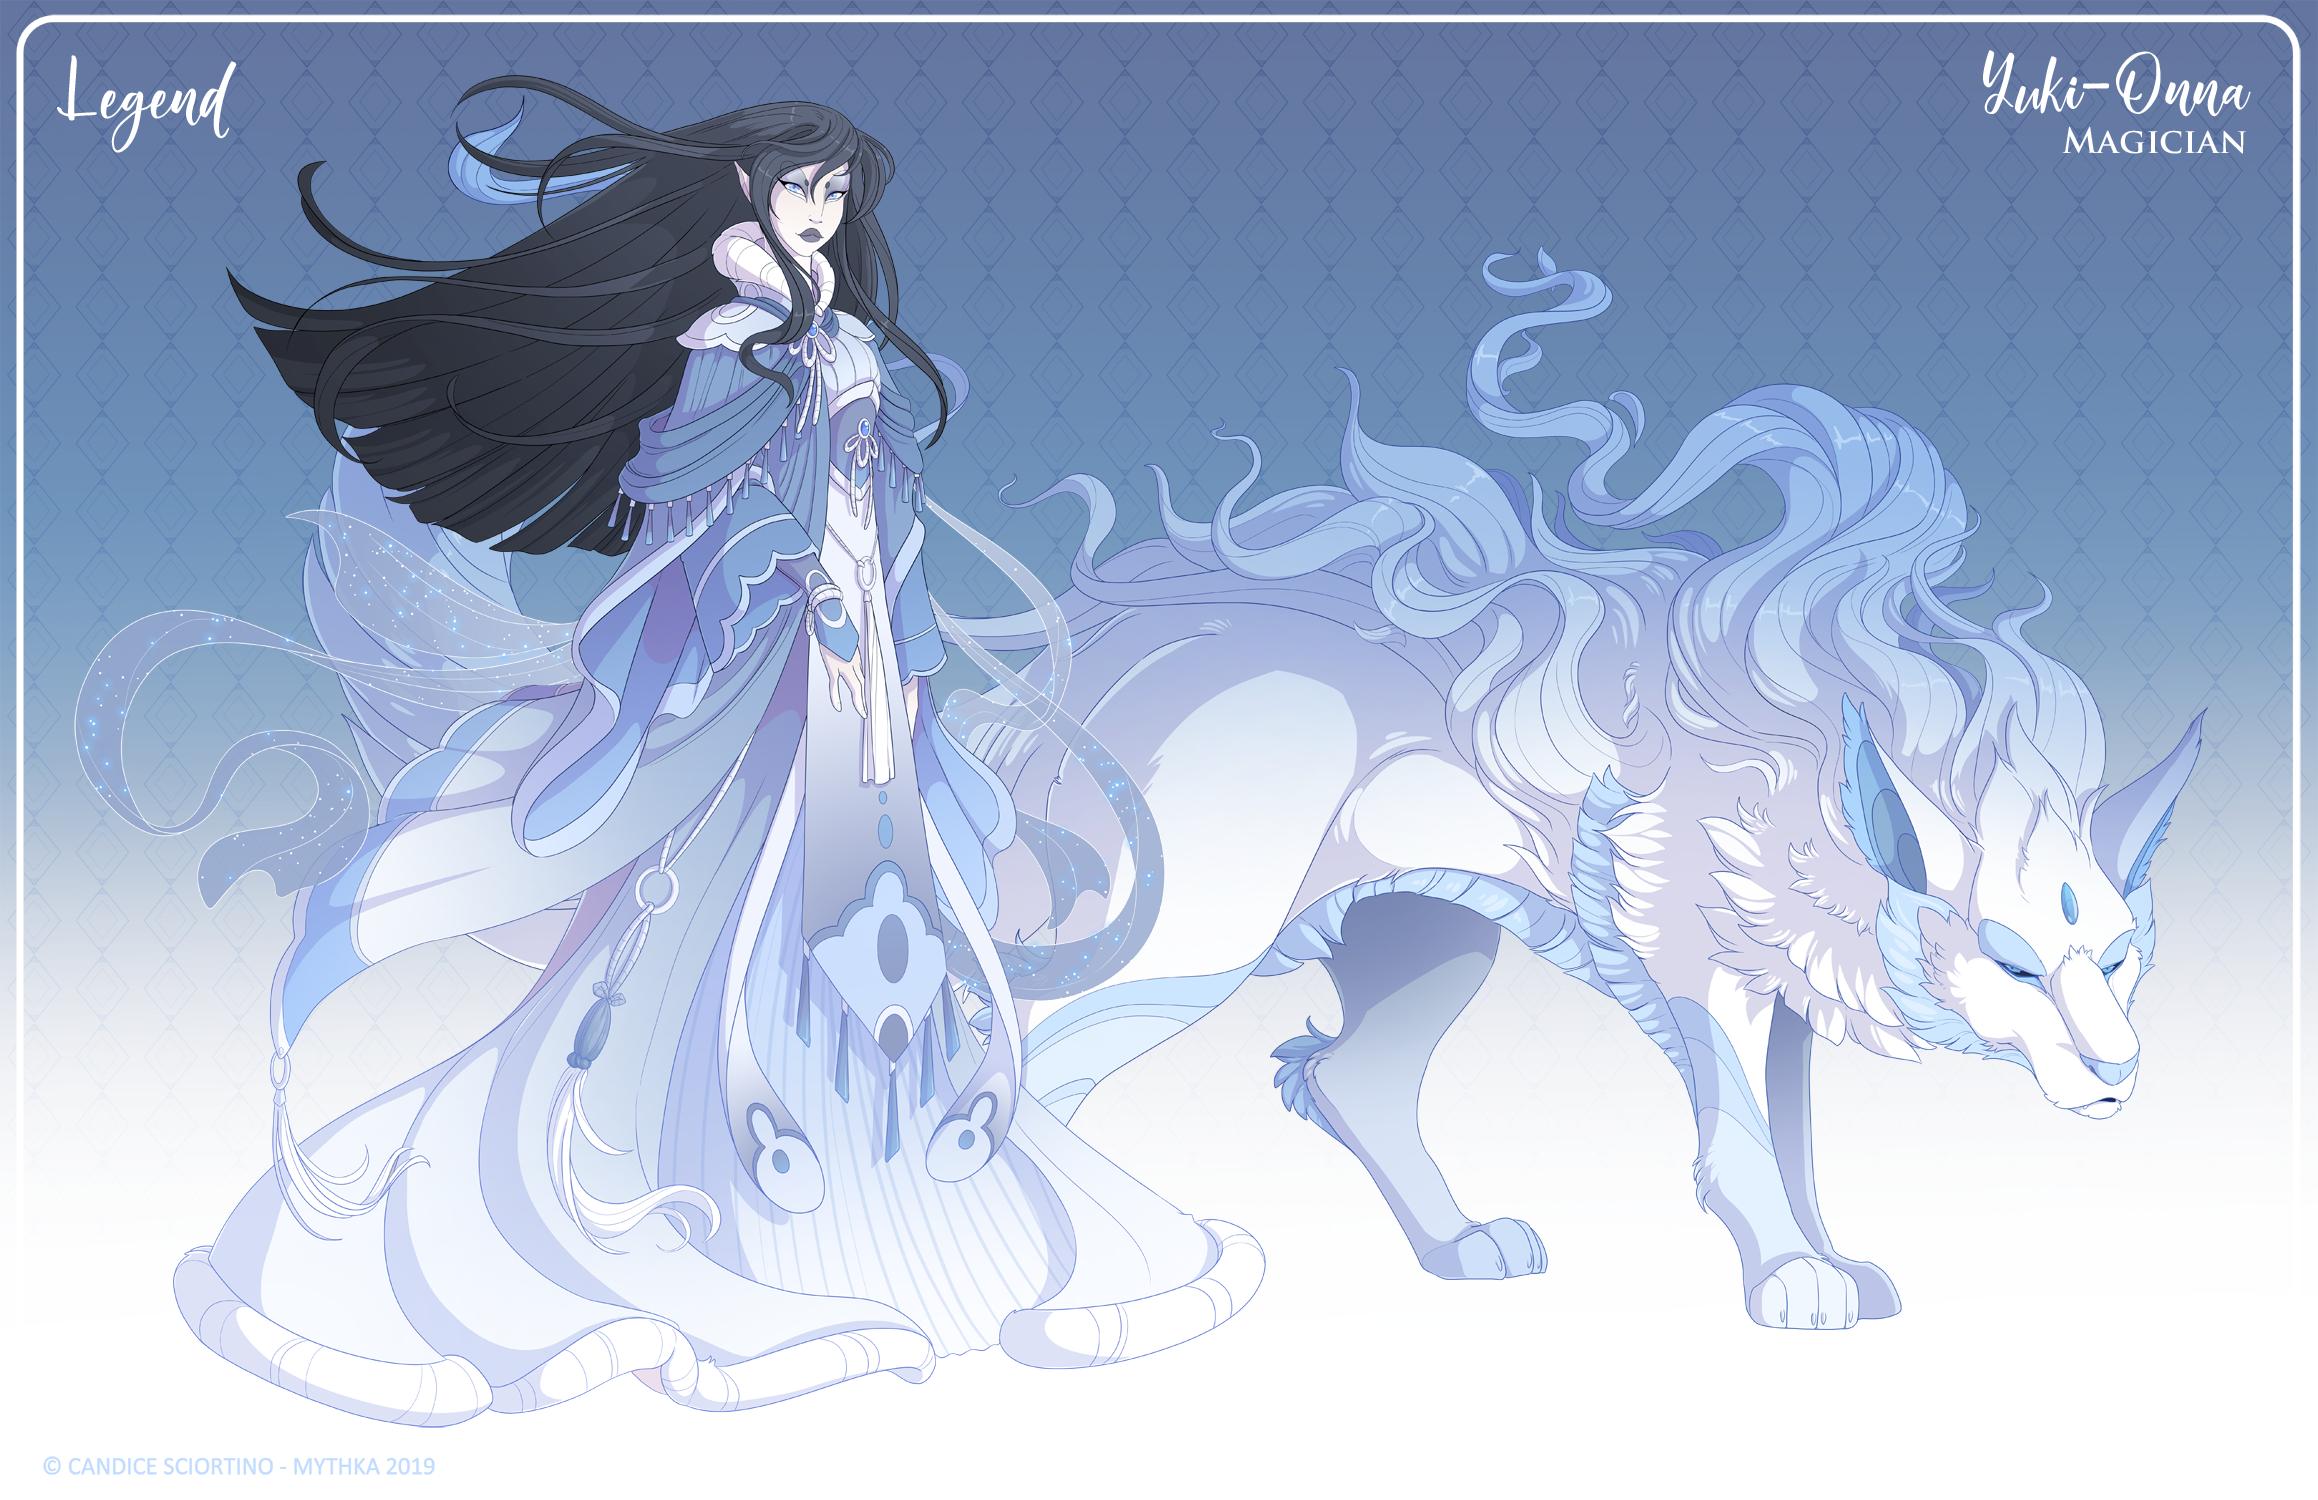 165 - (Legend) Yuki-onna